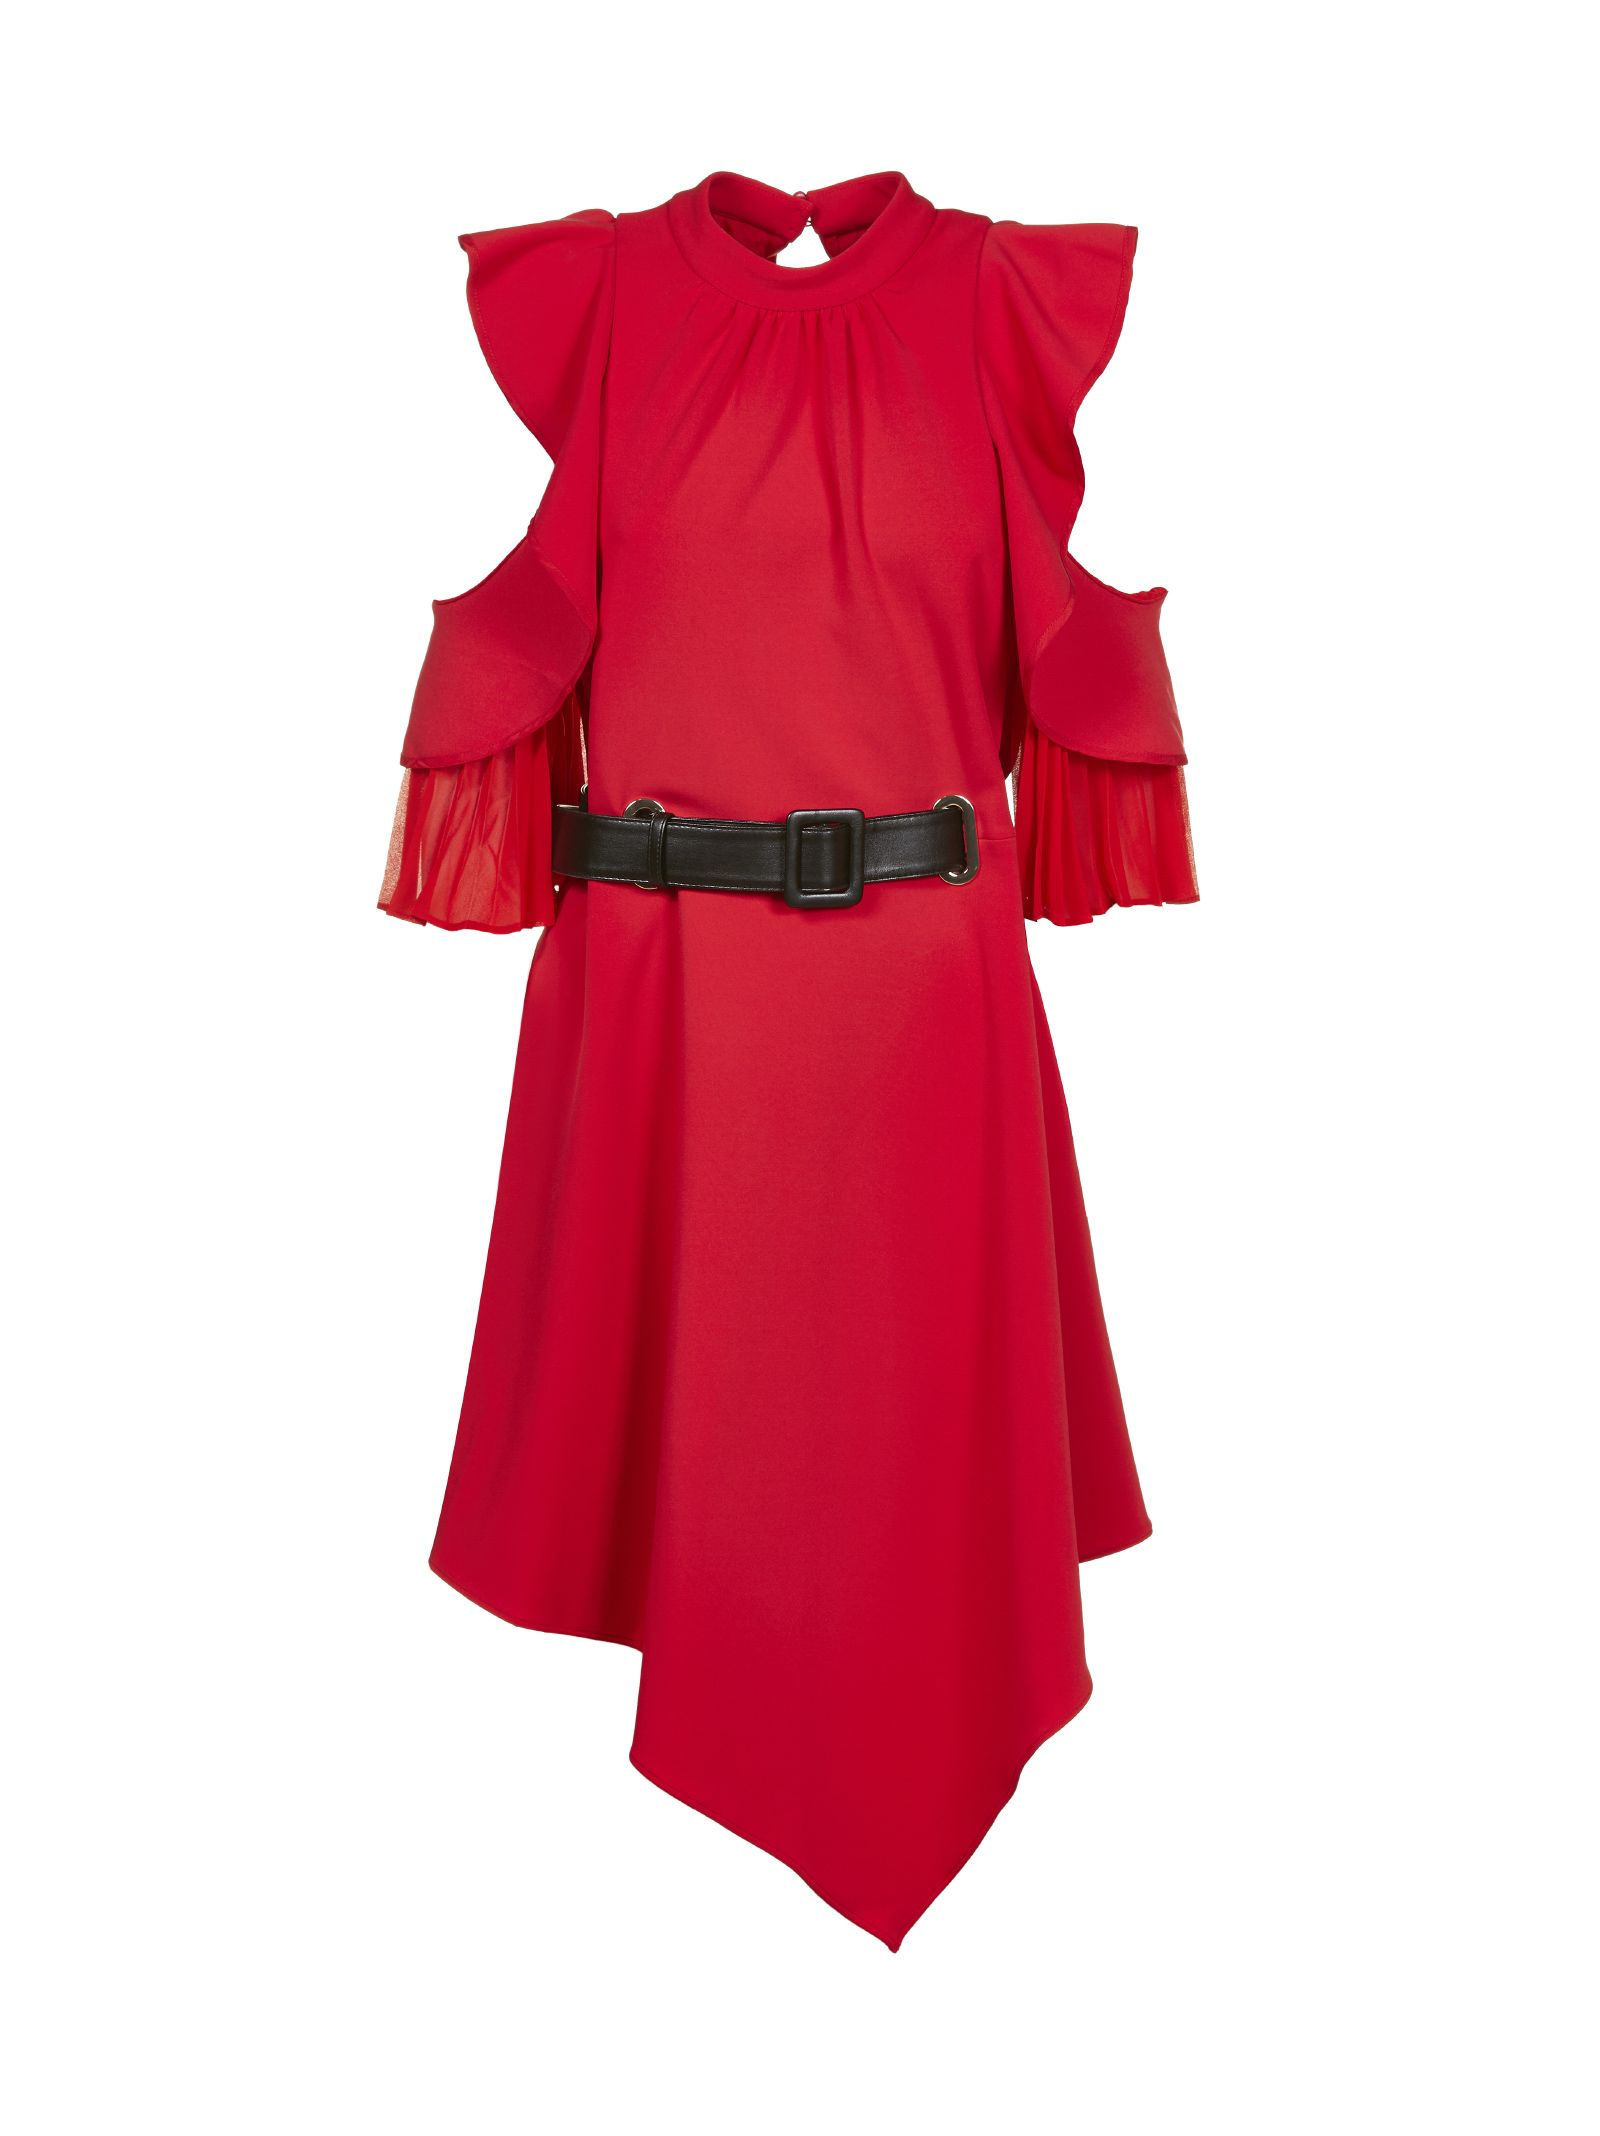 Self Portrait Asymmetric Ruffled Dress